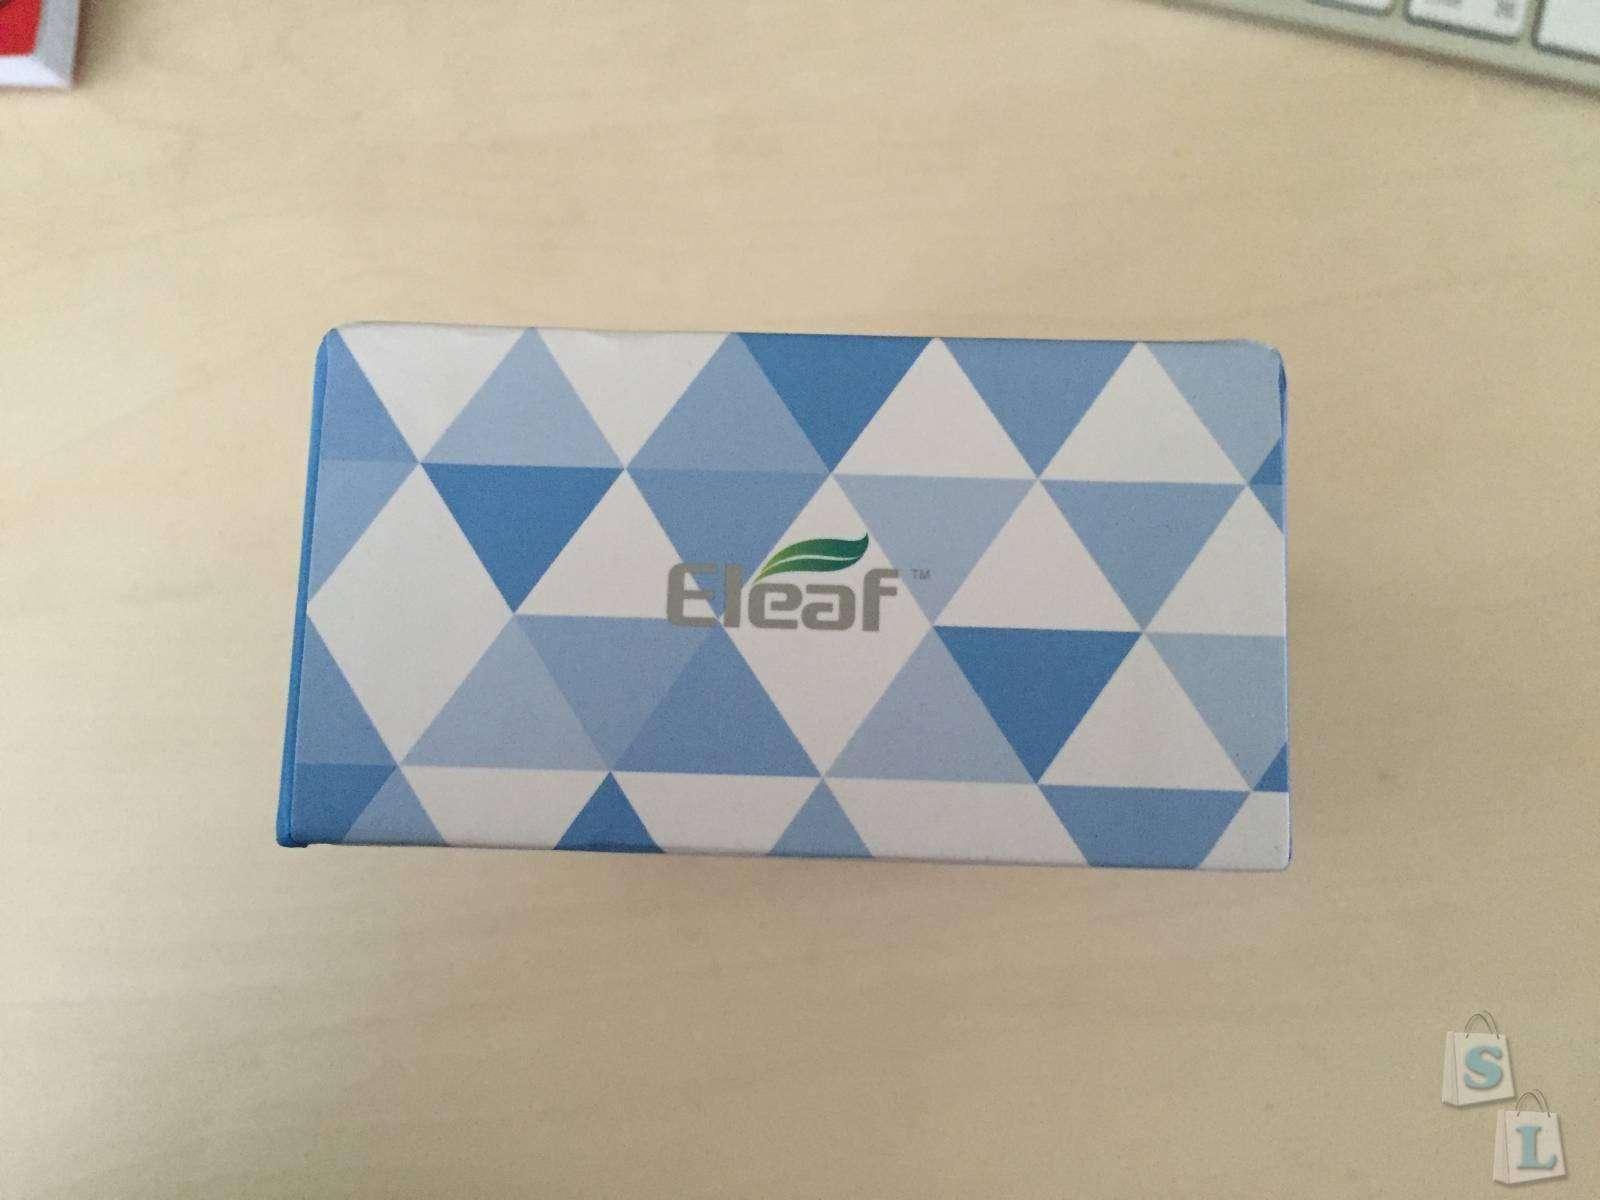 GearBest: Eleaf IJust 2 kit одна из лучших электронных сигарет